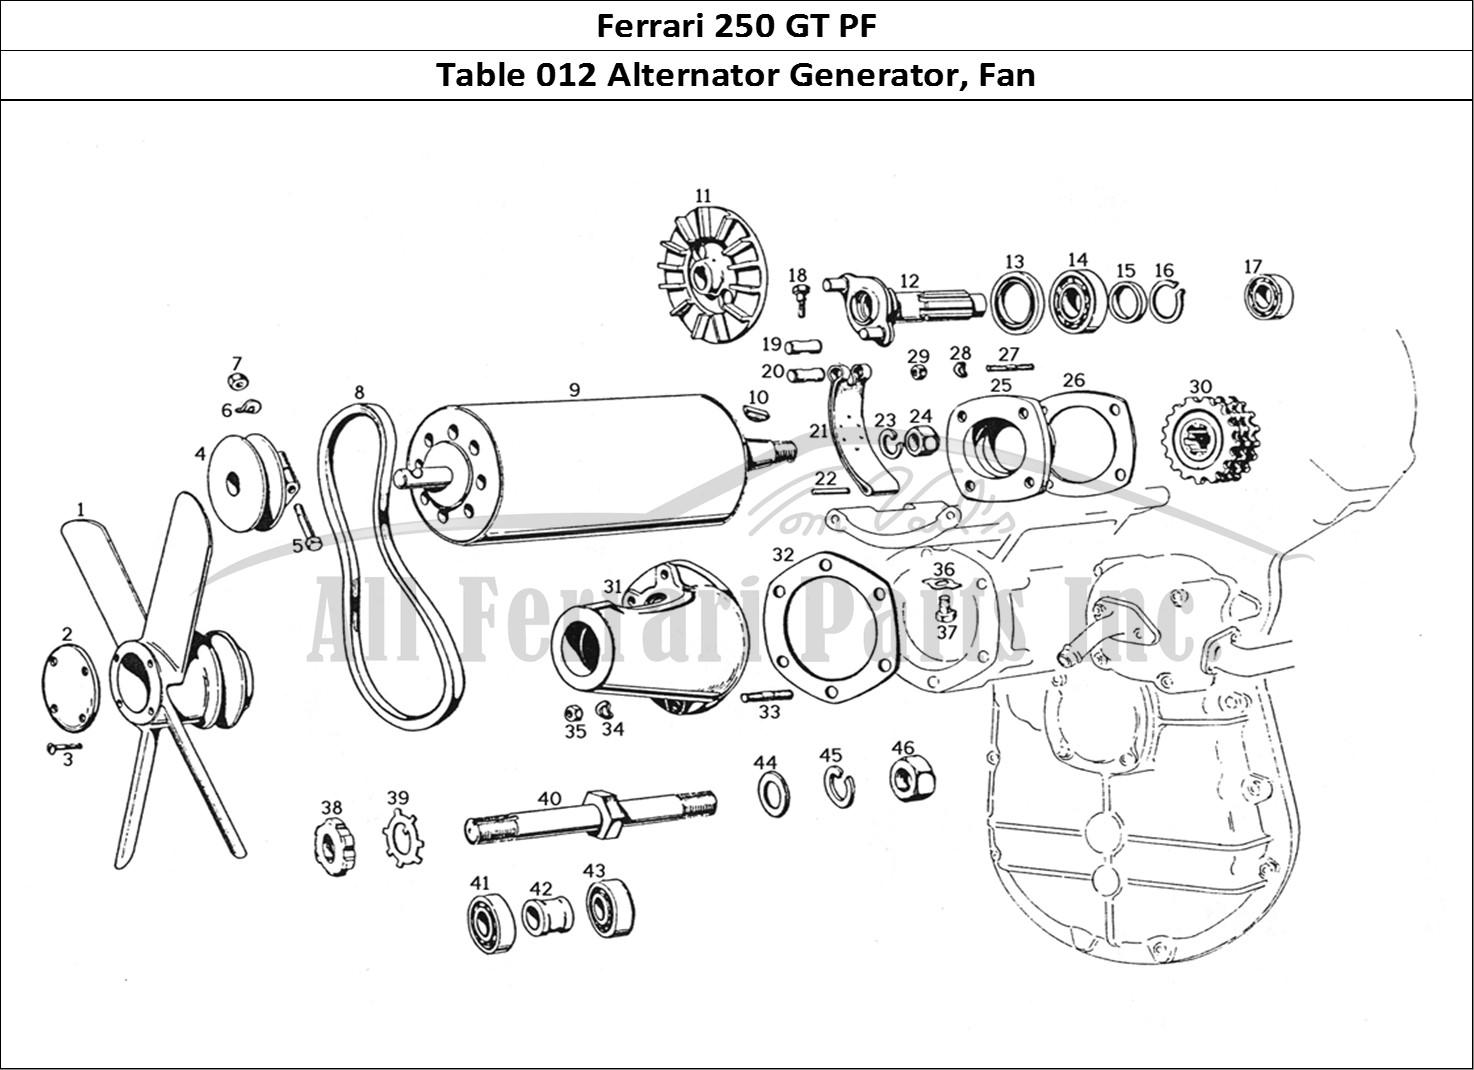 Buy original Ferrari 250 GT PF 012 Alternator Generator